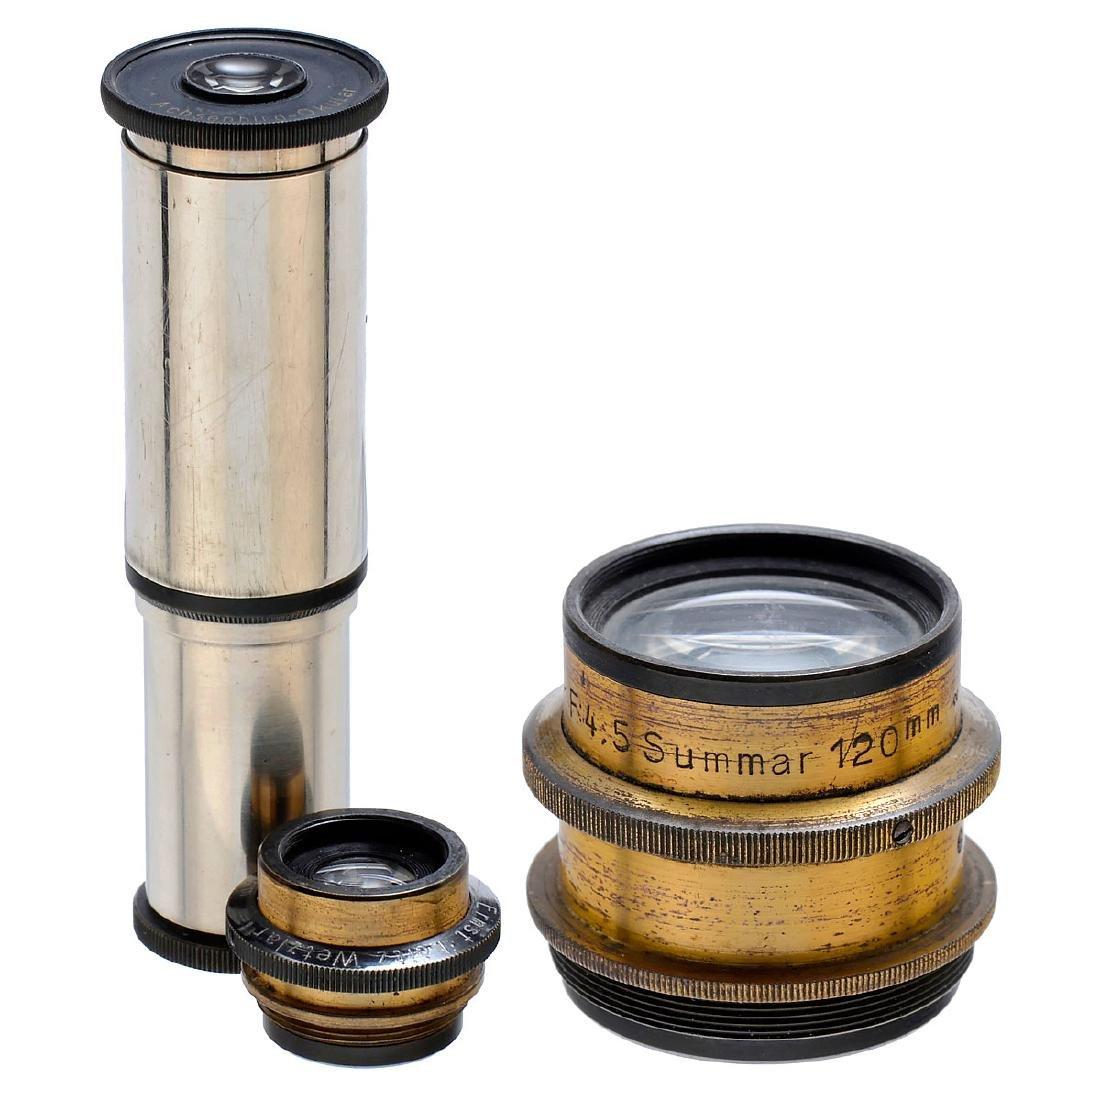 "Early Leitz ""Summar 4,5/120 mm"" Lens, c. 1905"